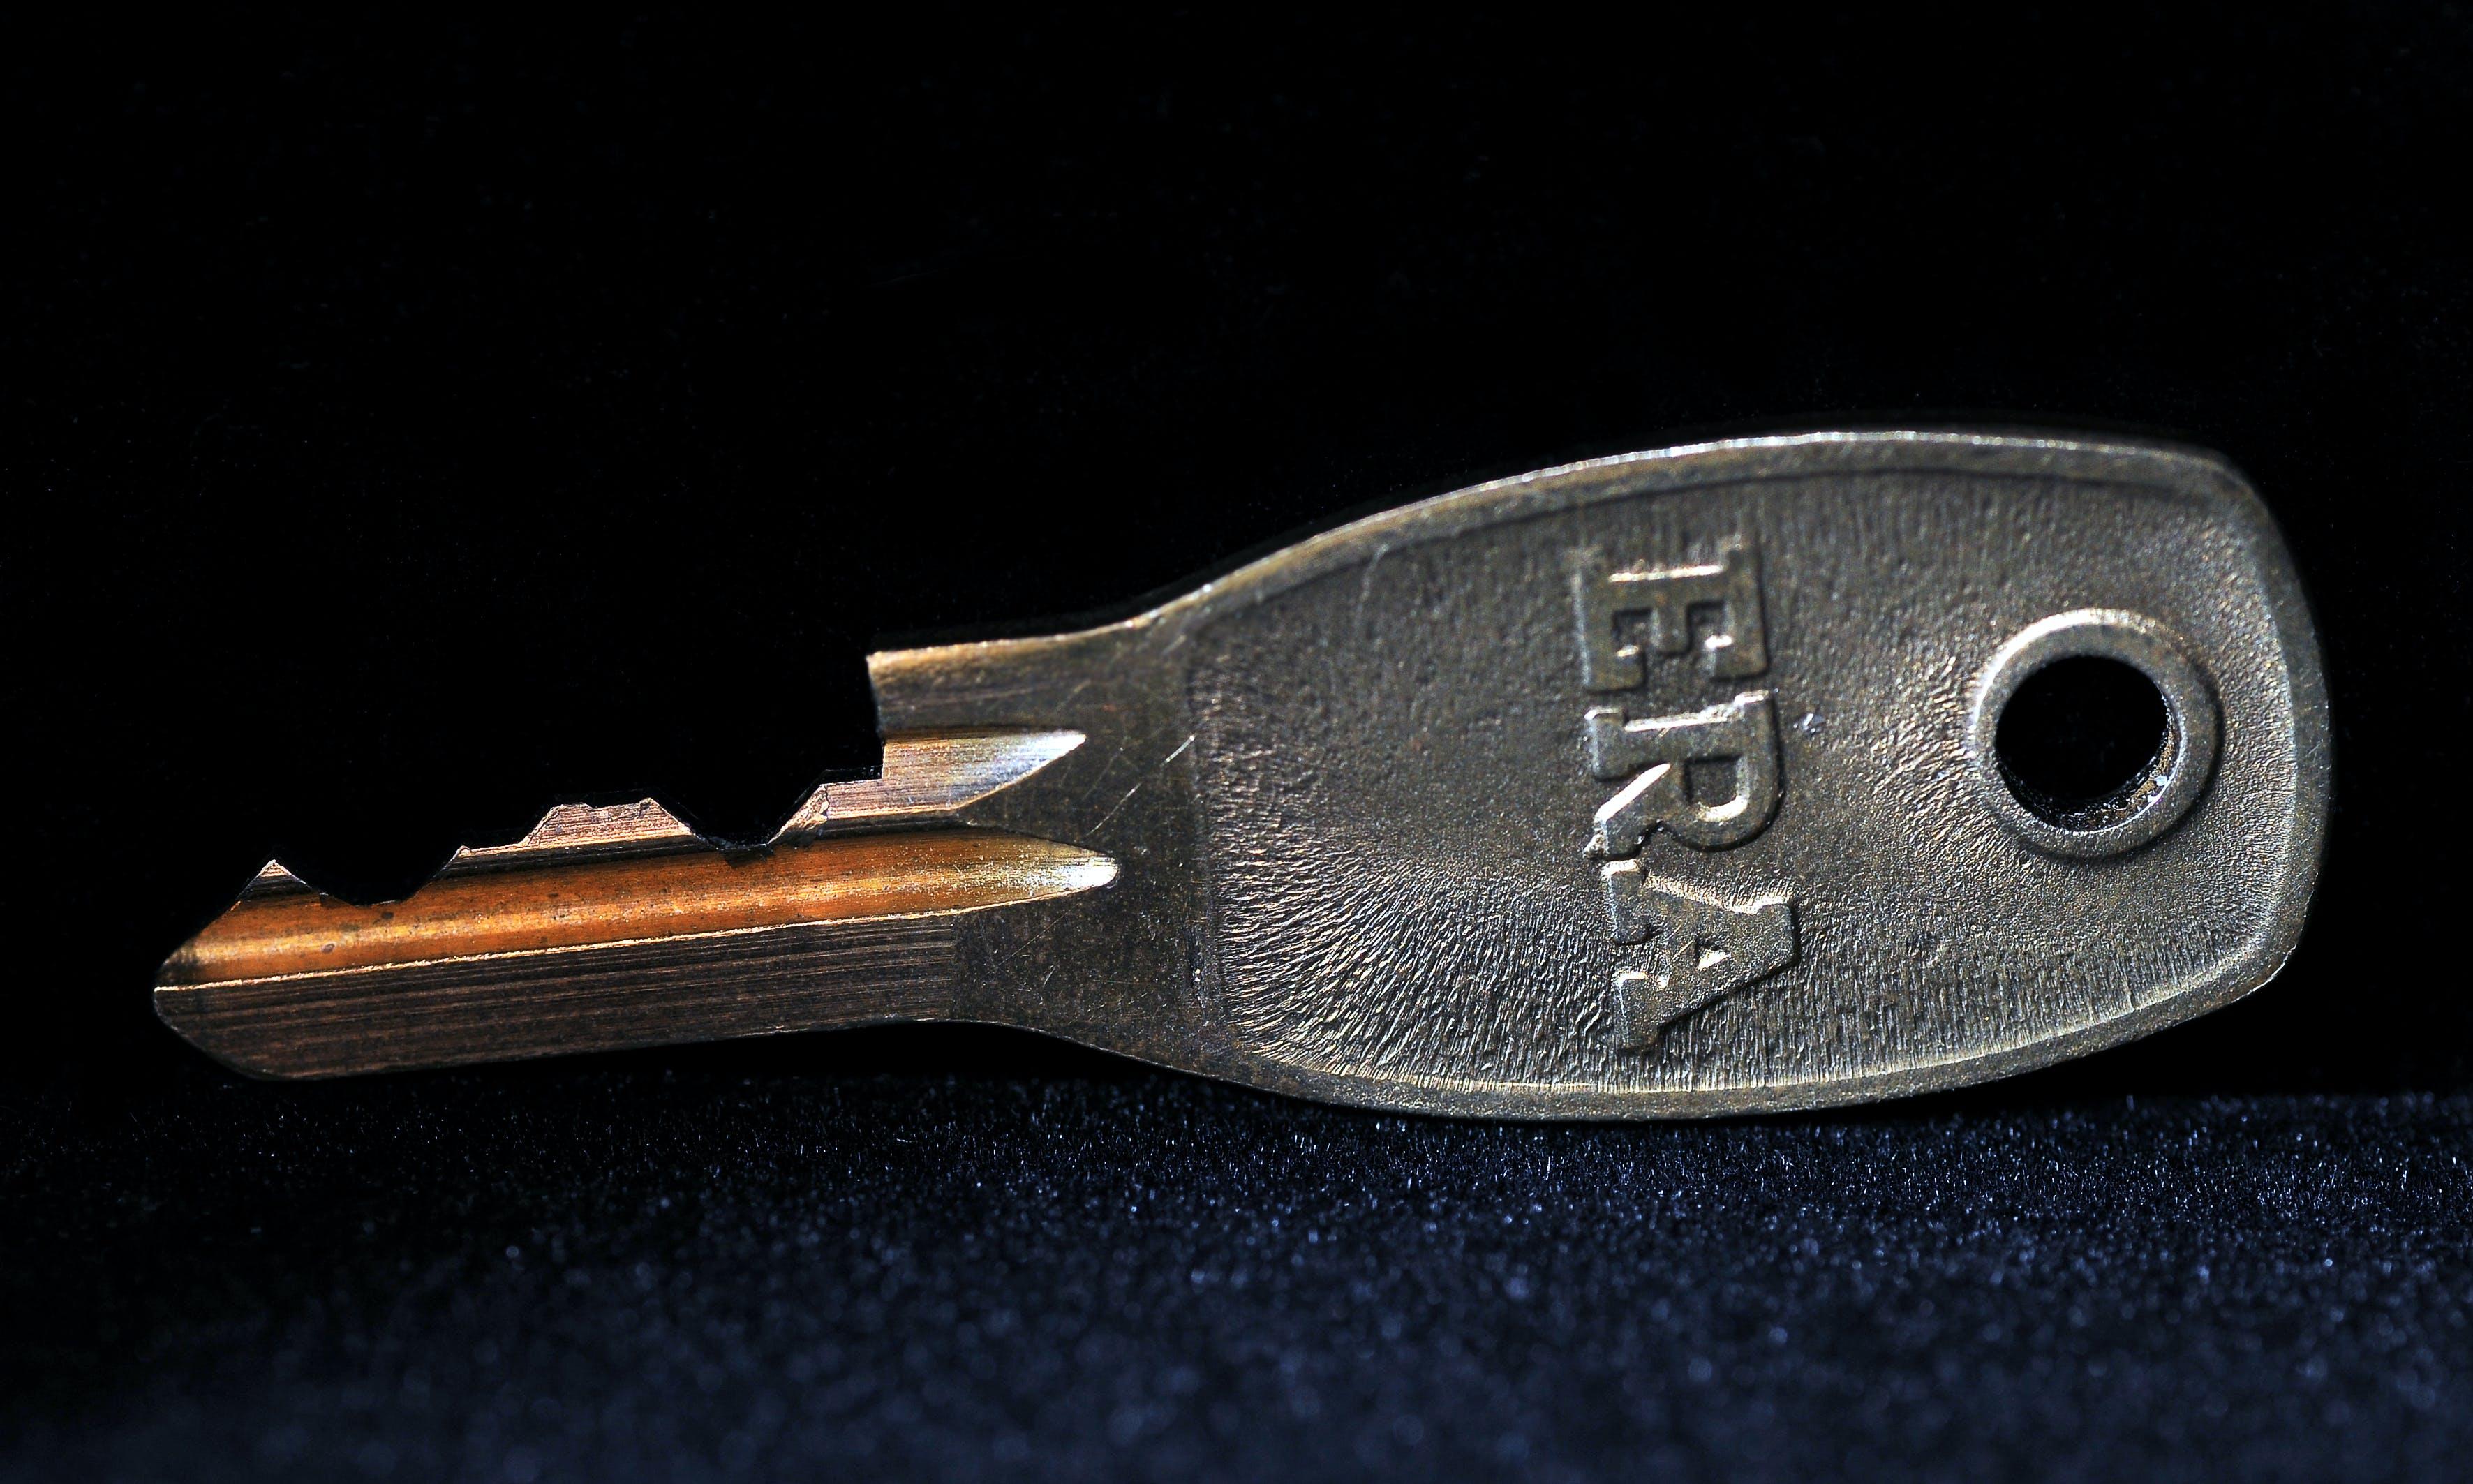 Free stock photo of Macro shot of a small window key